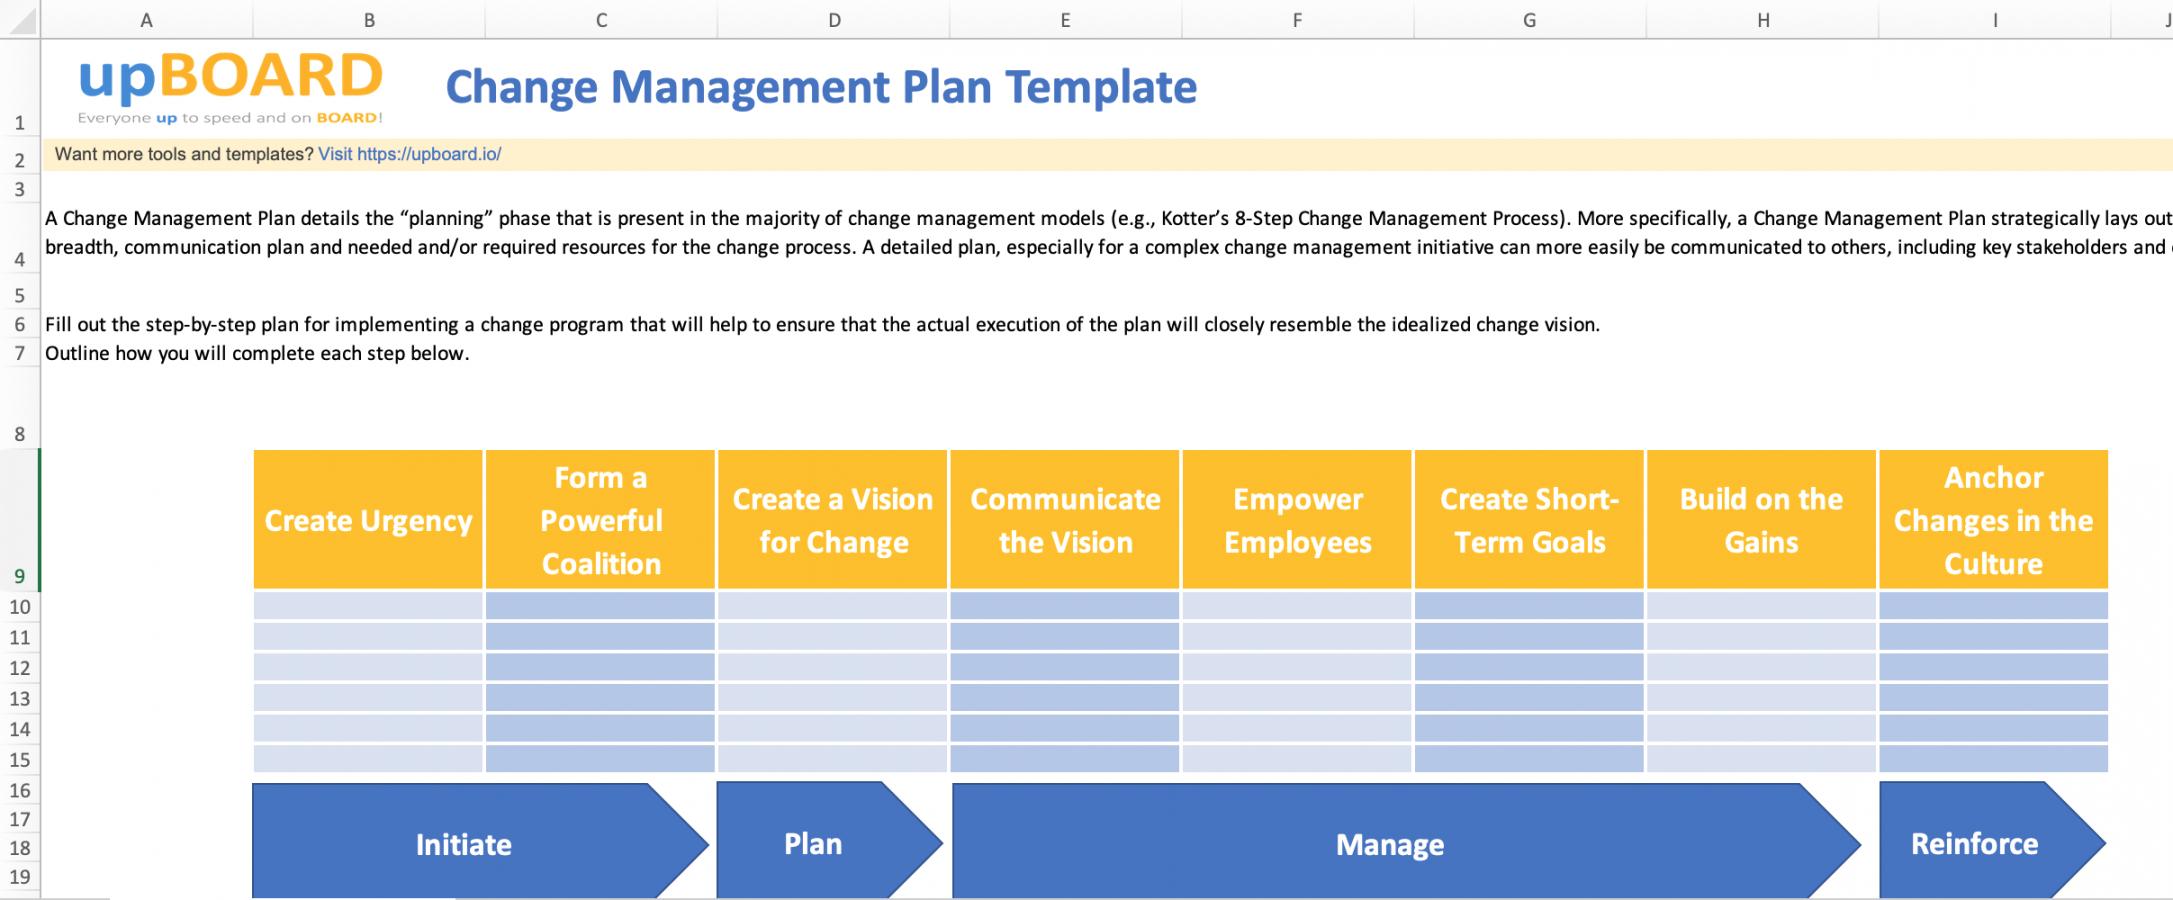 change management plan online software tools & templates content management strategy template excel